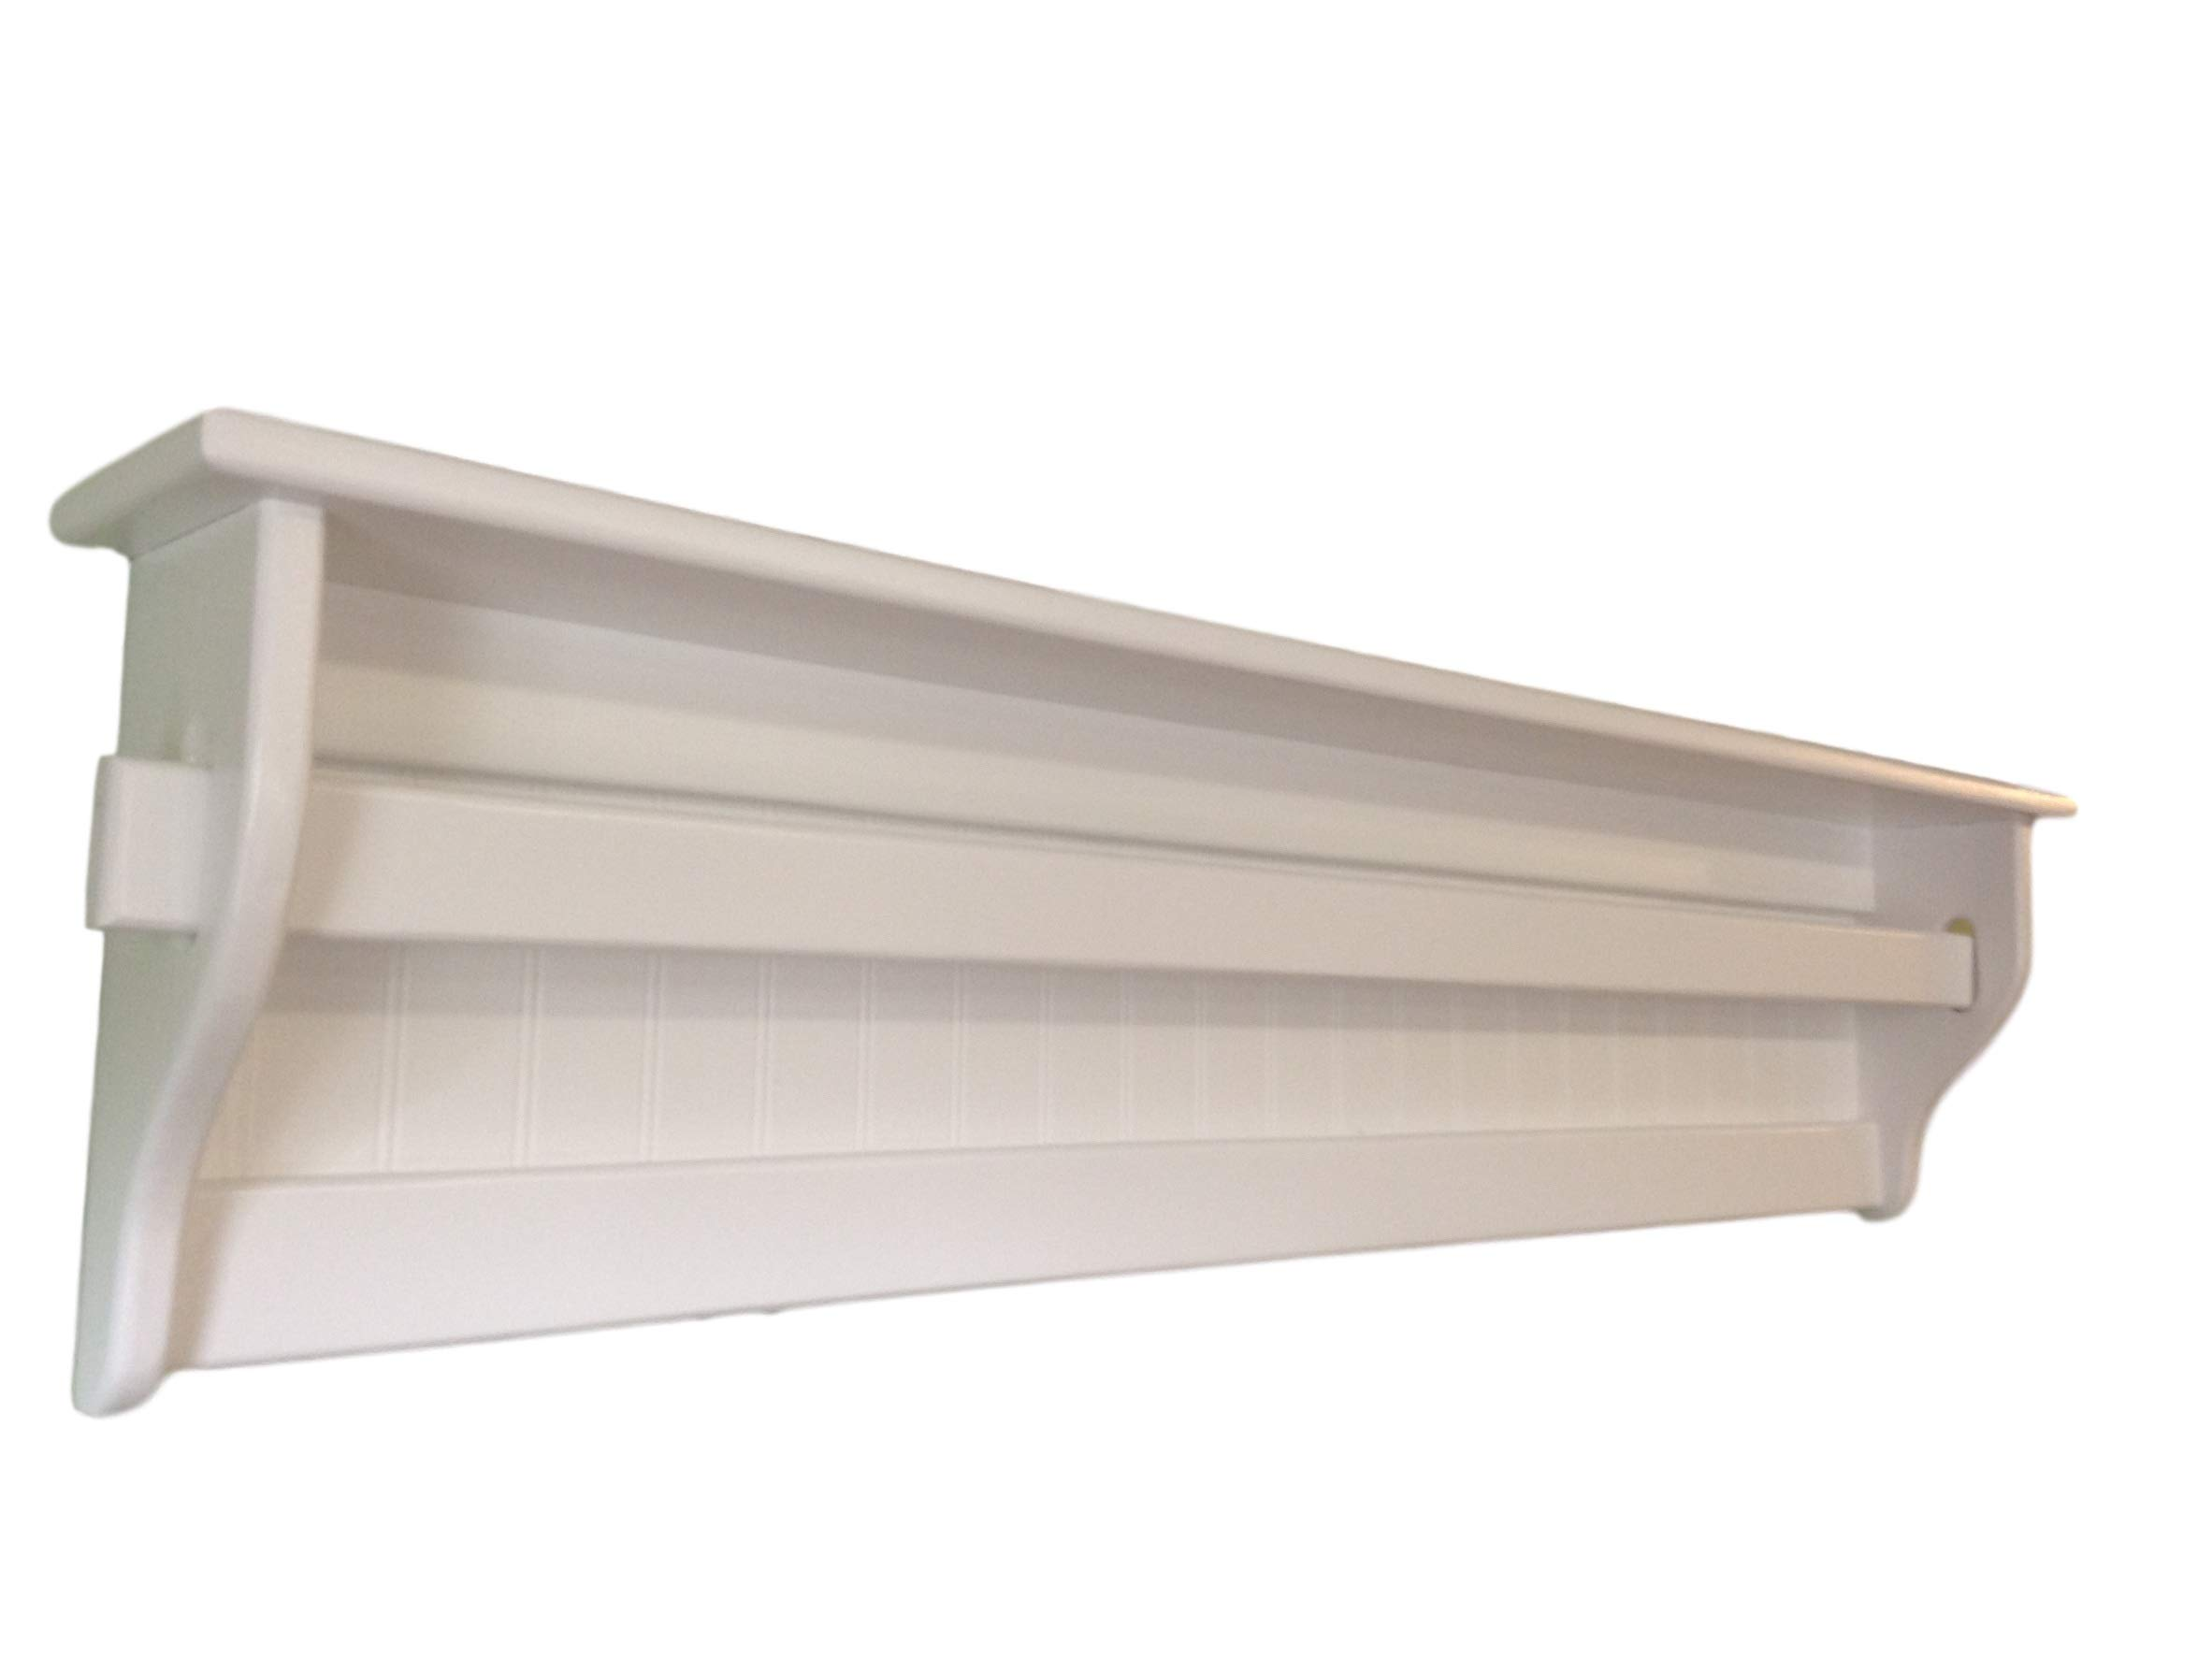 Wall Quilt Hanger with Shelf